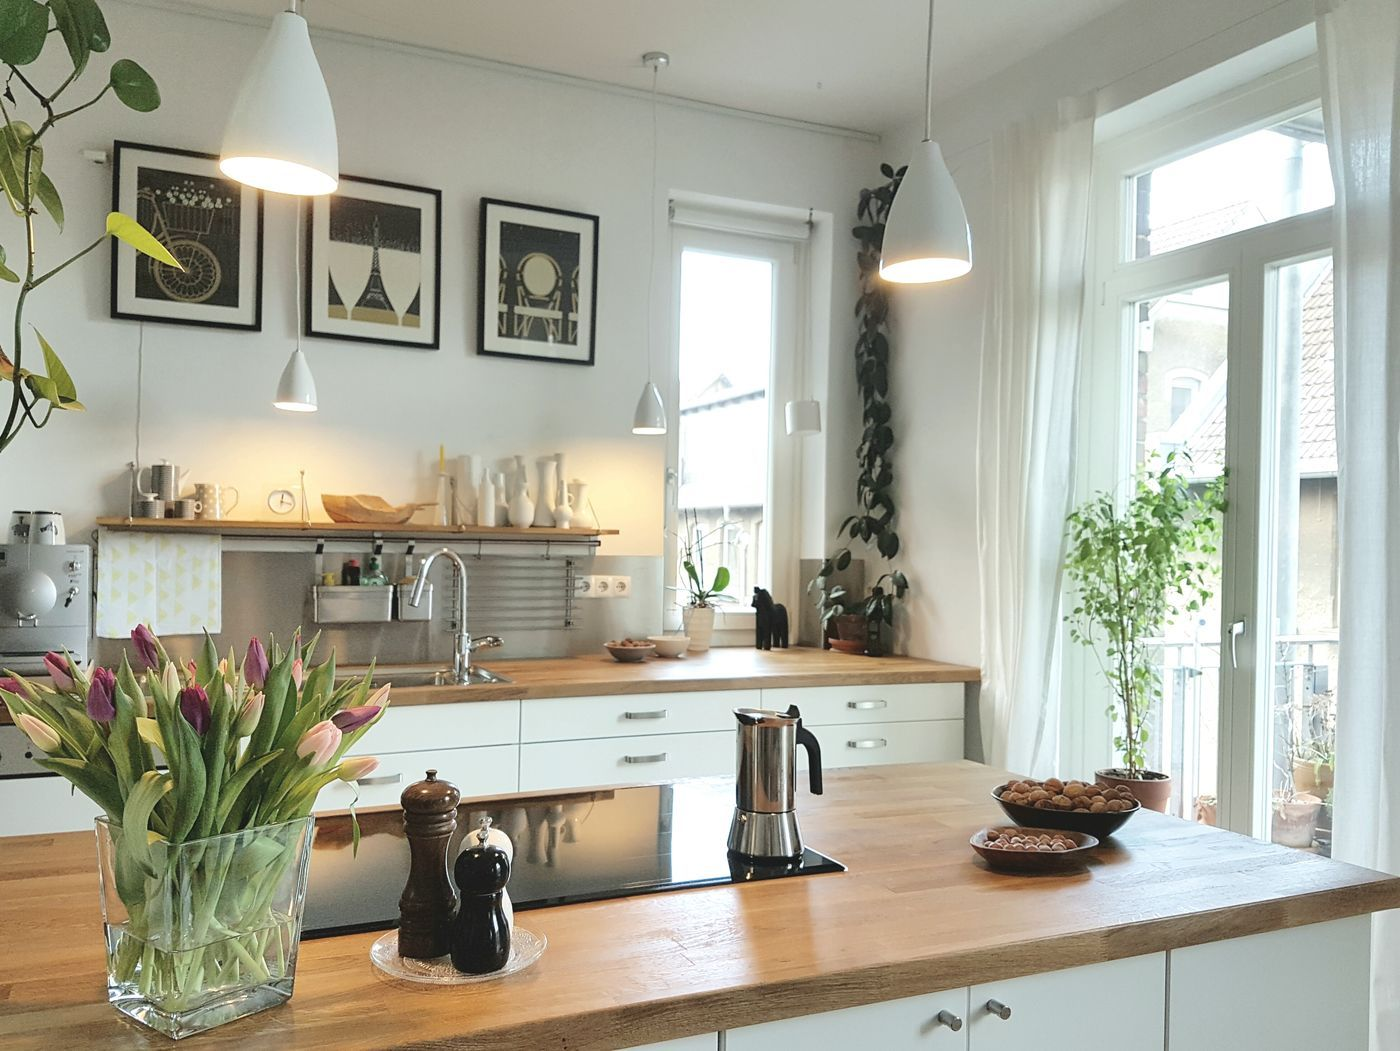 Sommerküche Ikea : Sommerküche selber bauen elegant küche selber bauen luxus geniale